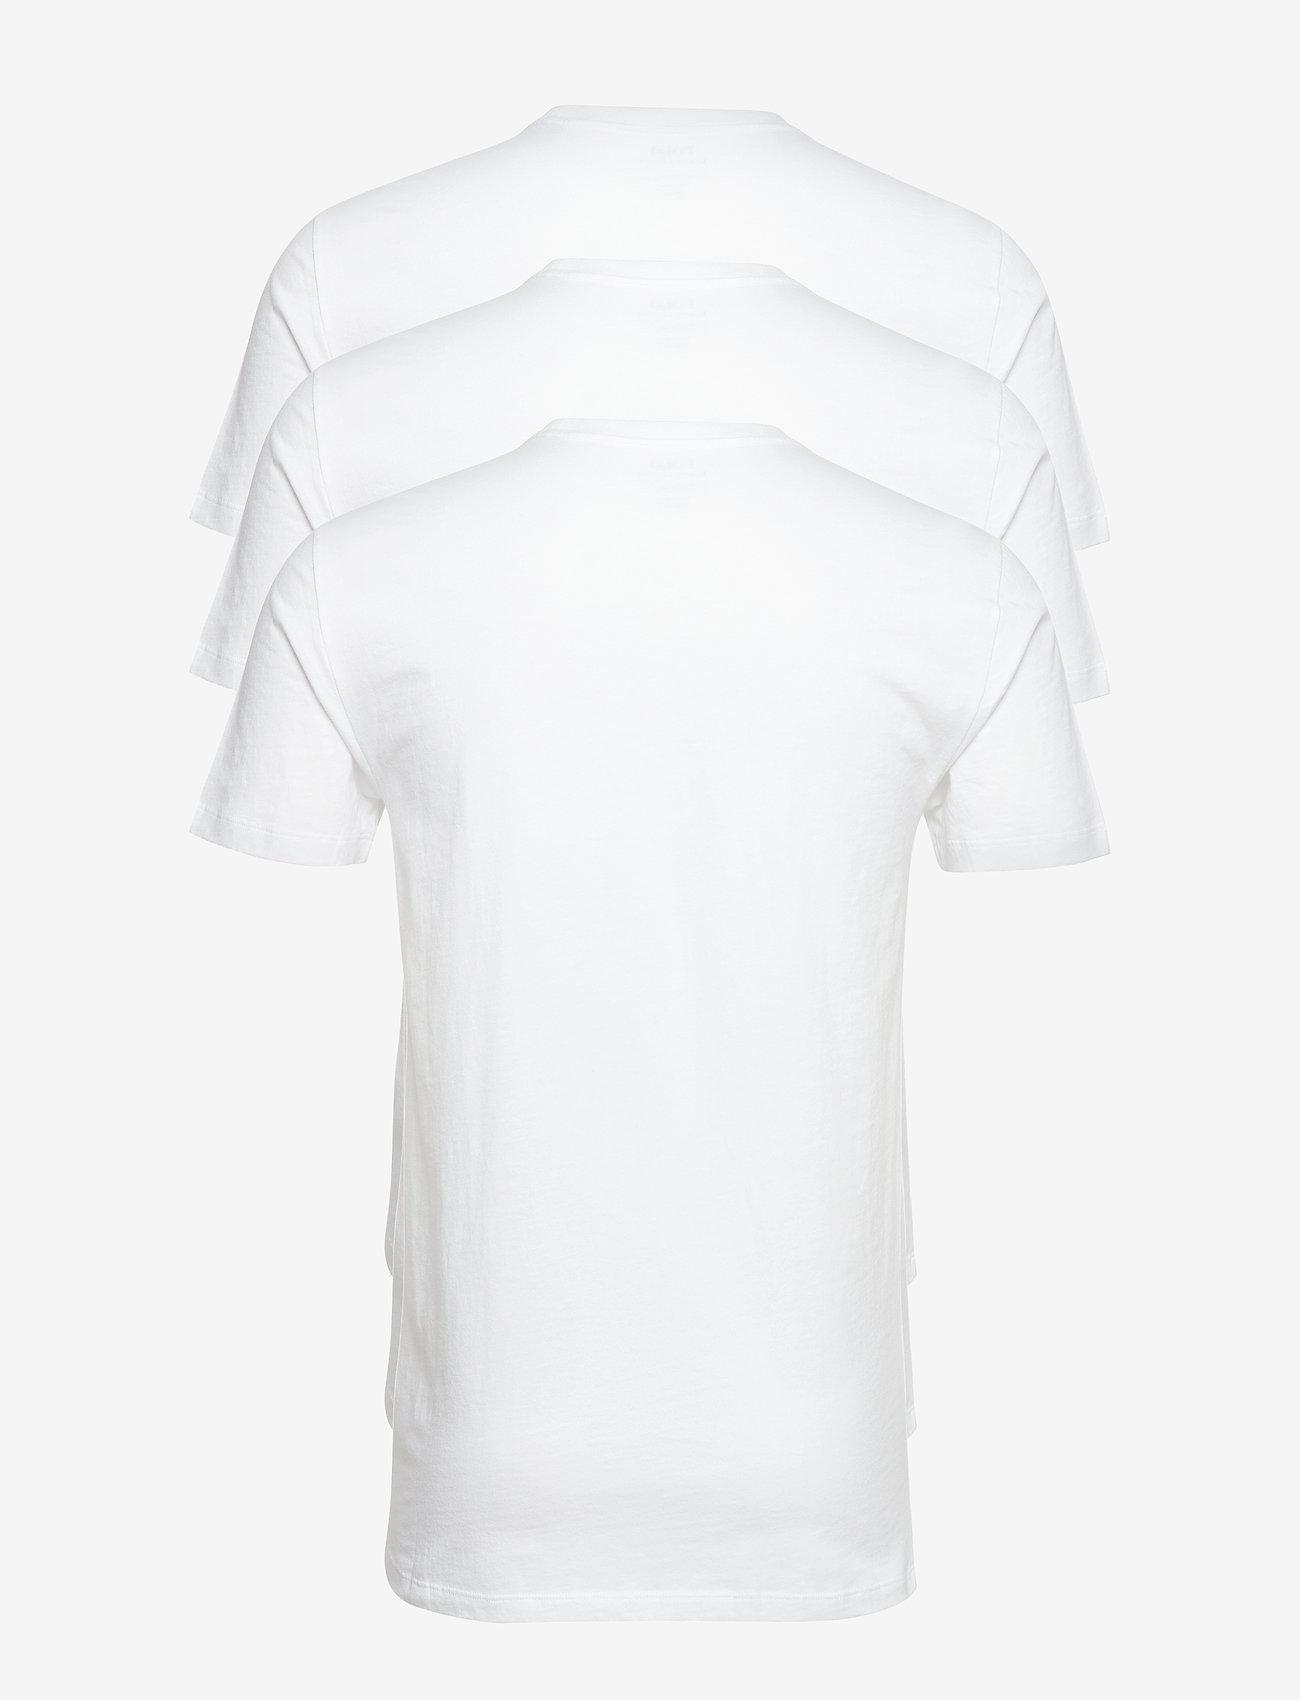 Polo Ralph Lauren Underwear - Cotton Crewneck 3-Pack - multipack - 3pk white/white/w - 1